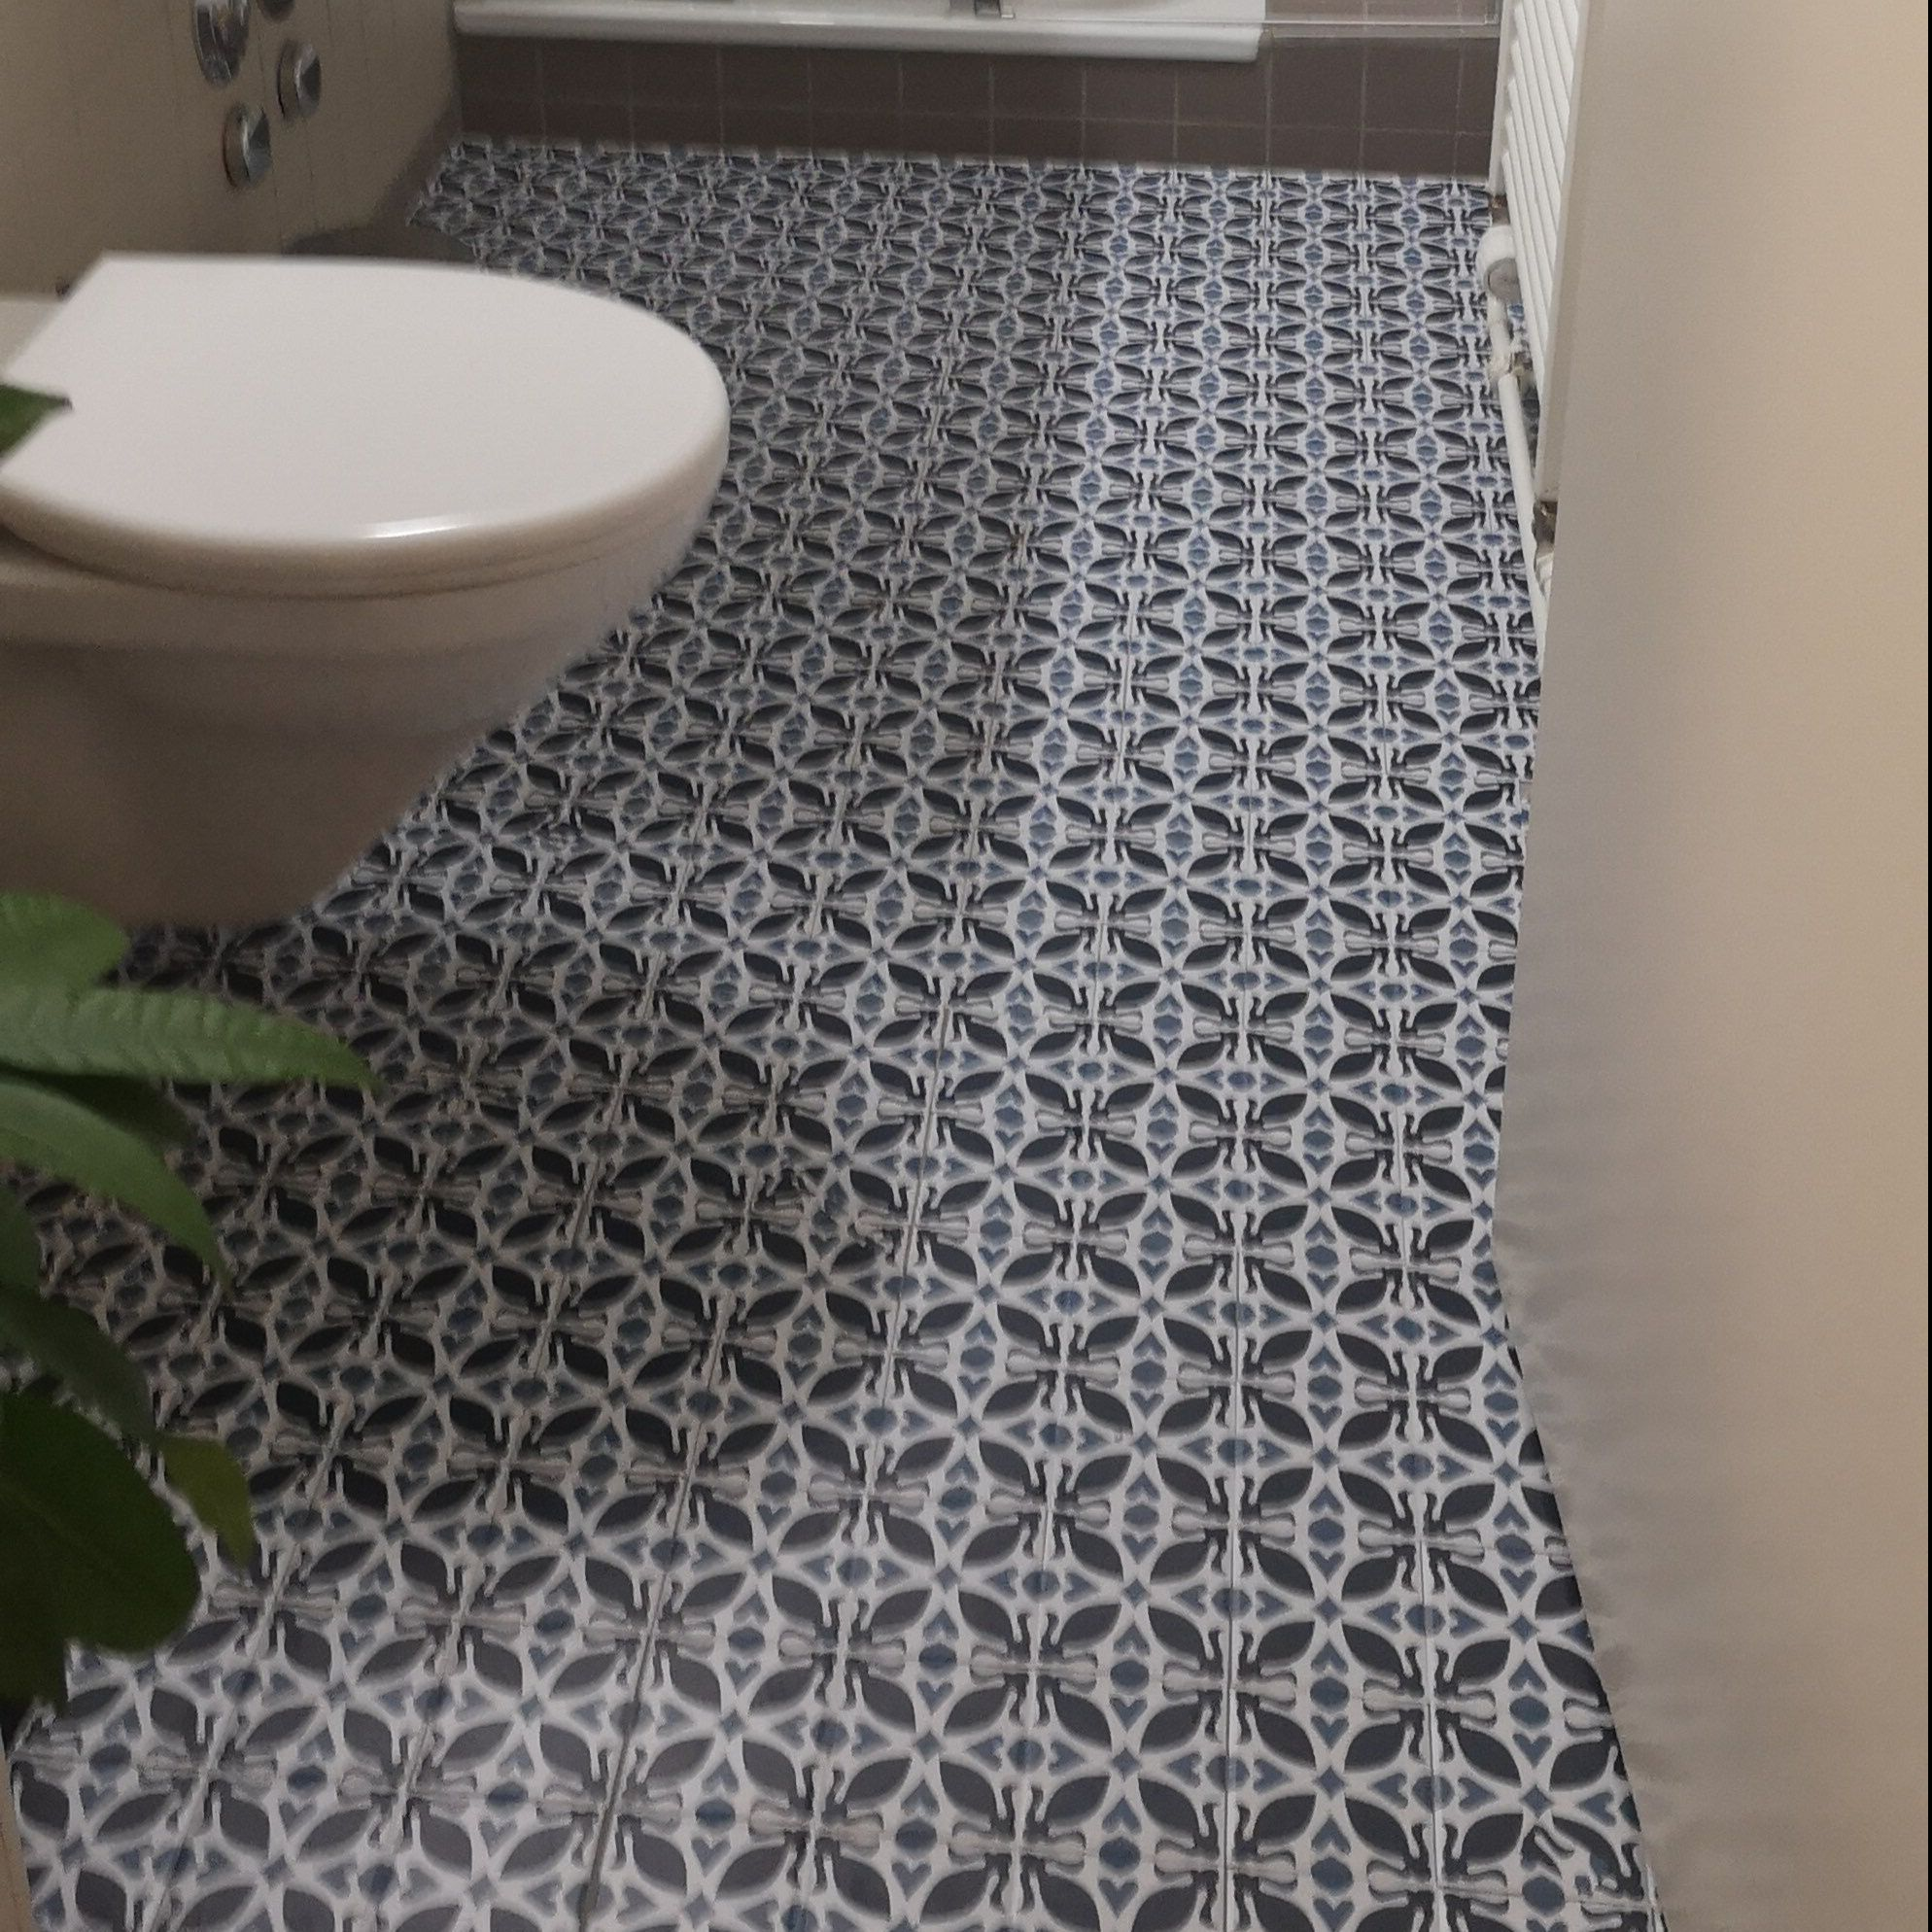 Pvc Rugs Floor Tile Stickers Kitchen Tile Stickers By Printip Tile Decals Tile Stickers Kitchen Tile Backsplash Bathroom